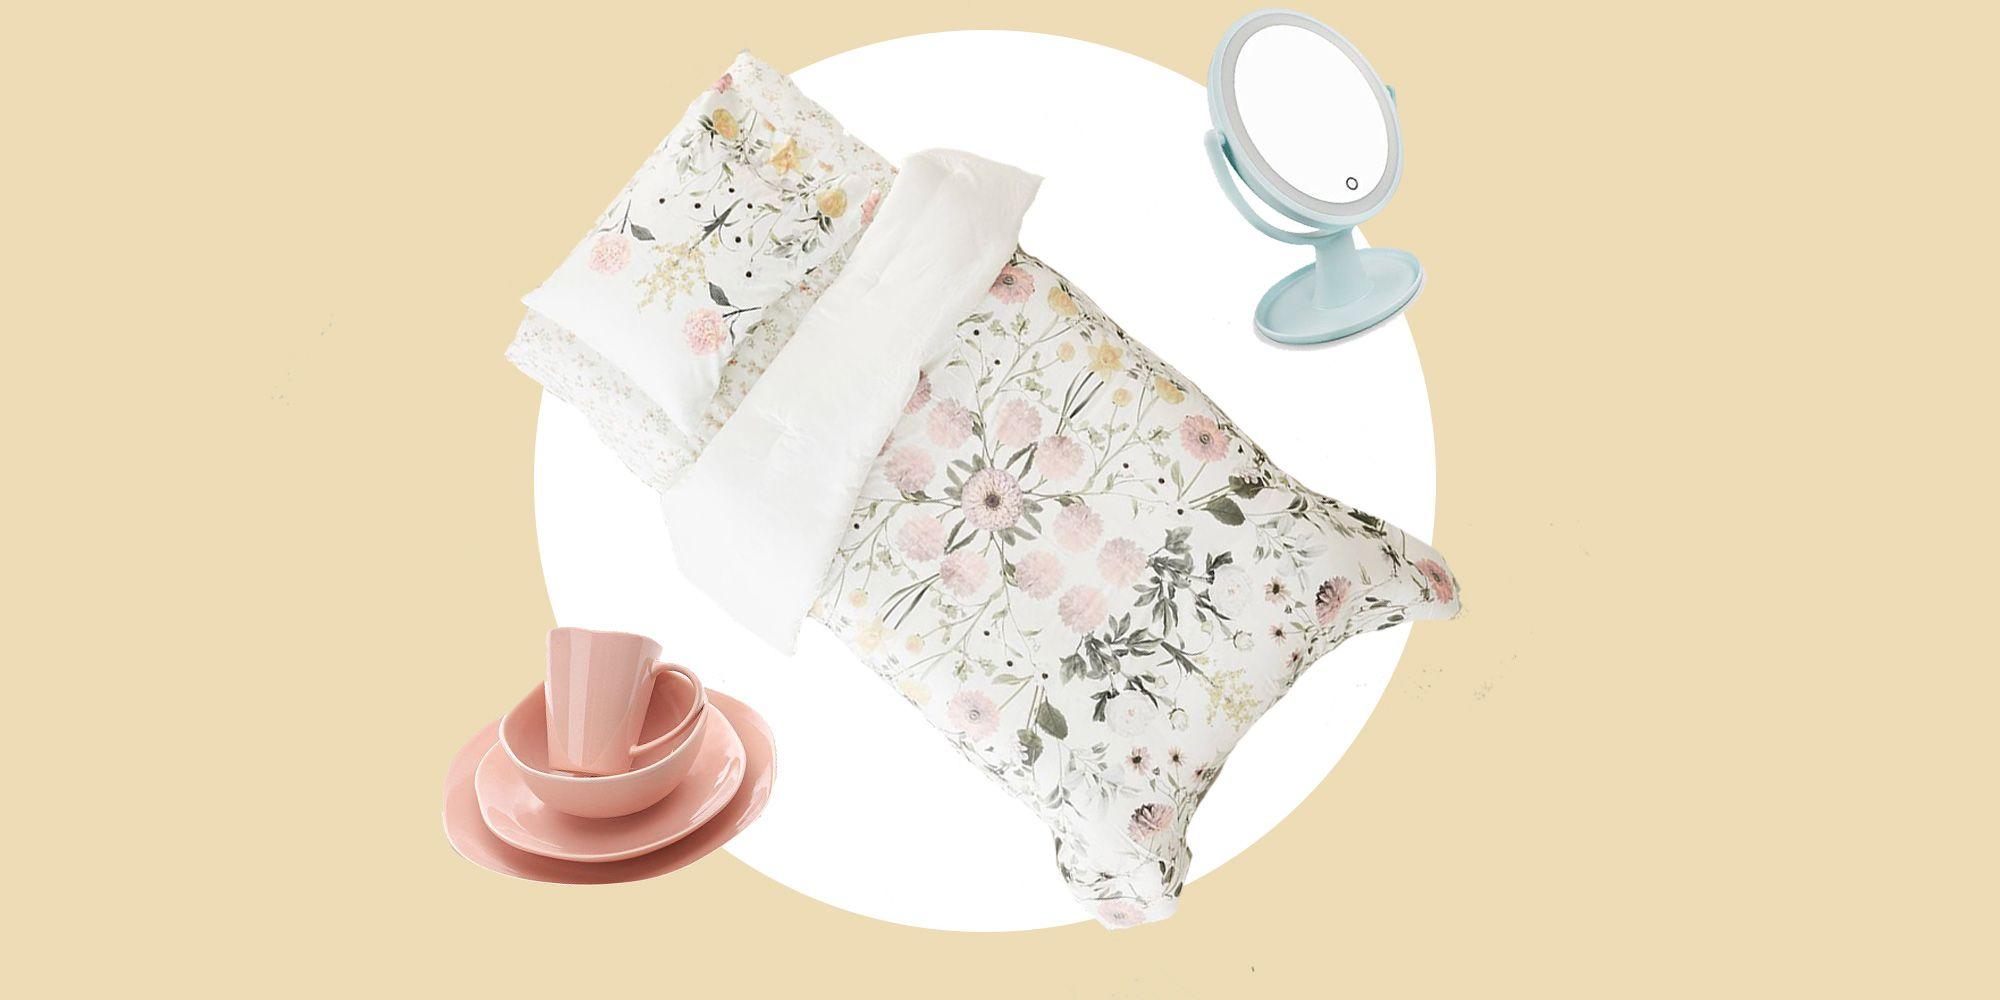 29 College Dorm Room Essentials 2019 Cute College Dorm Items